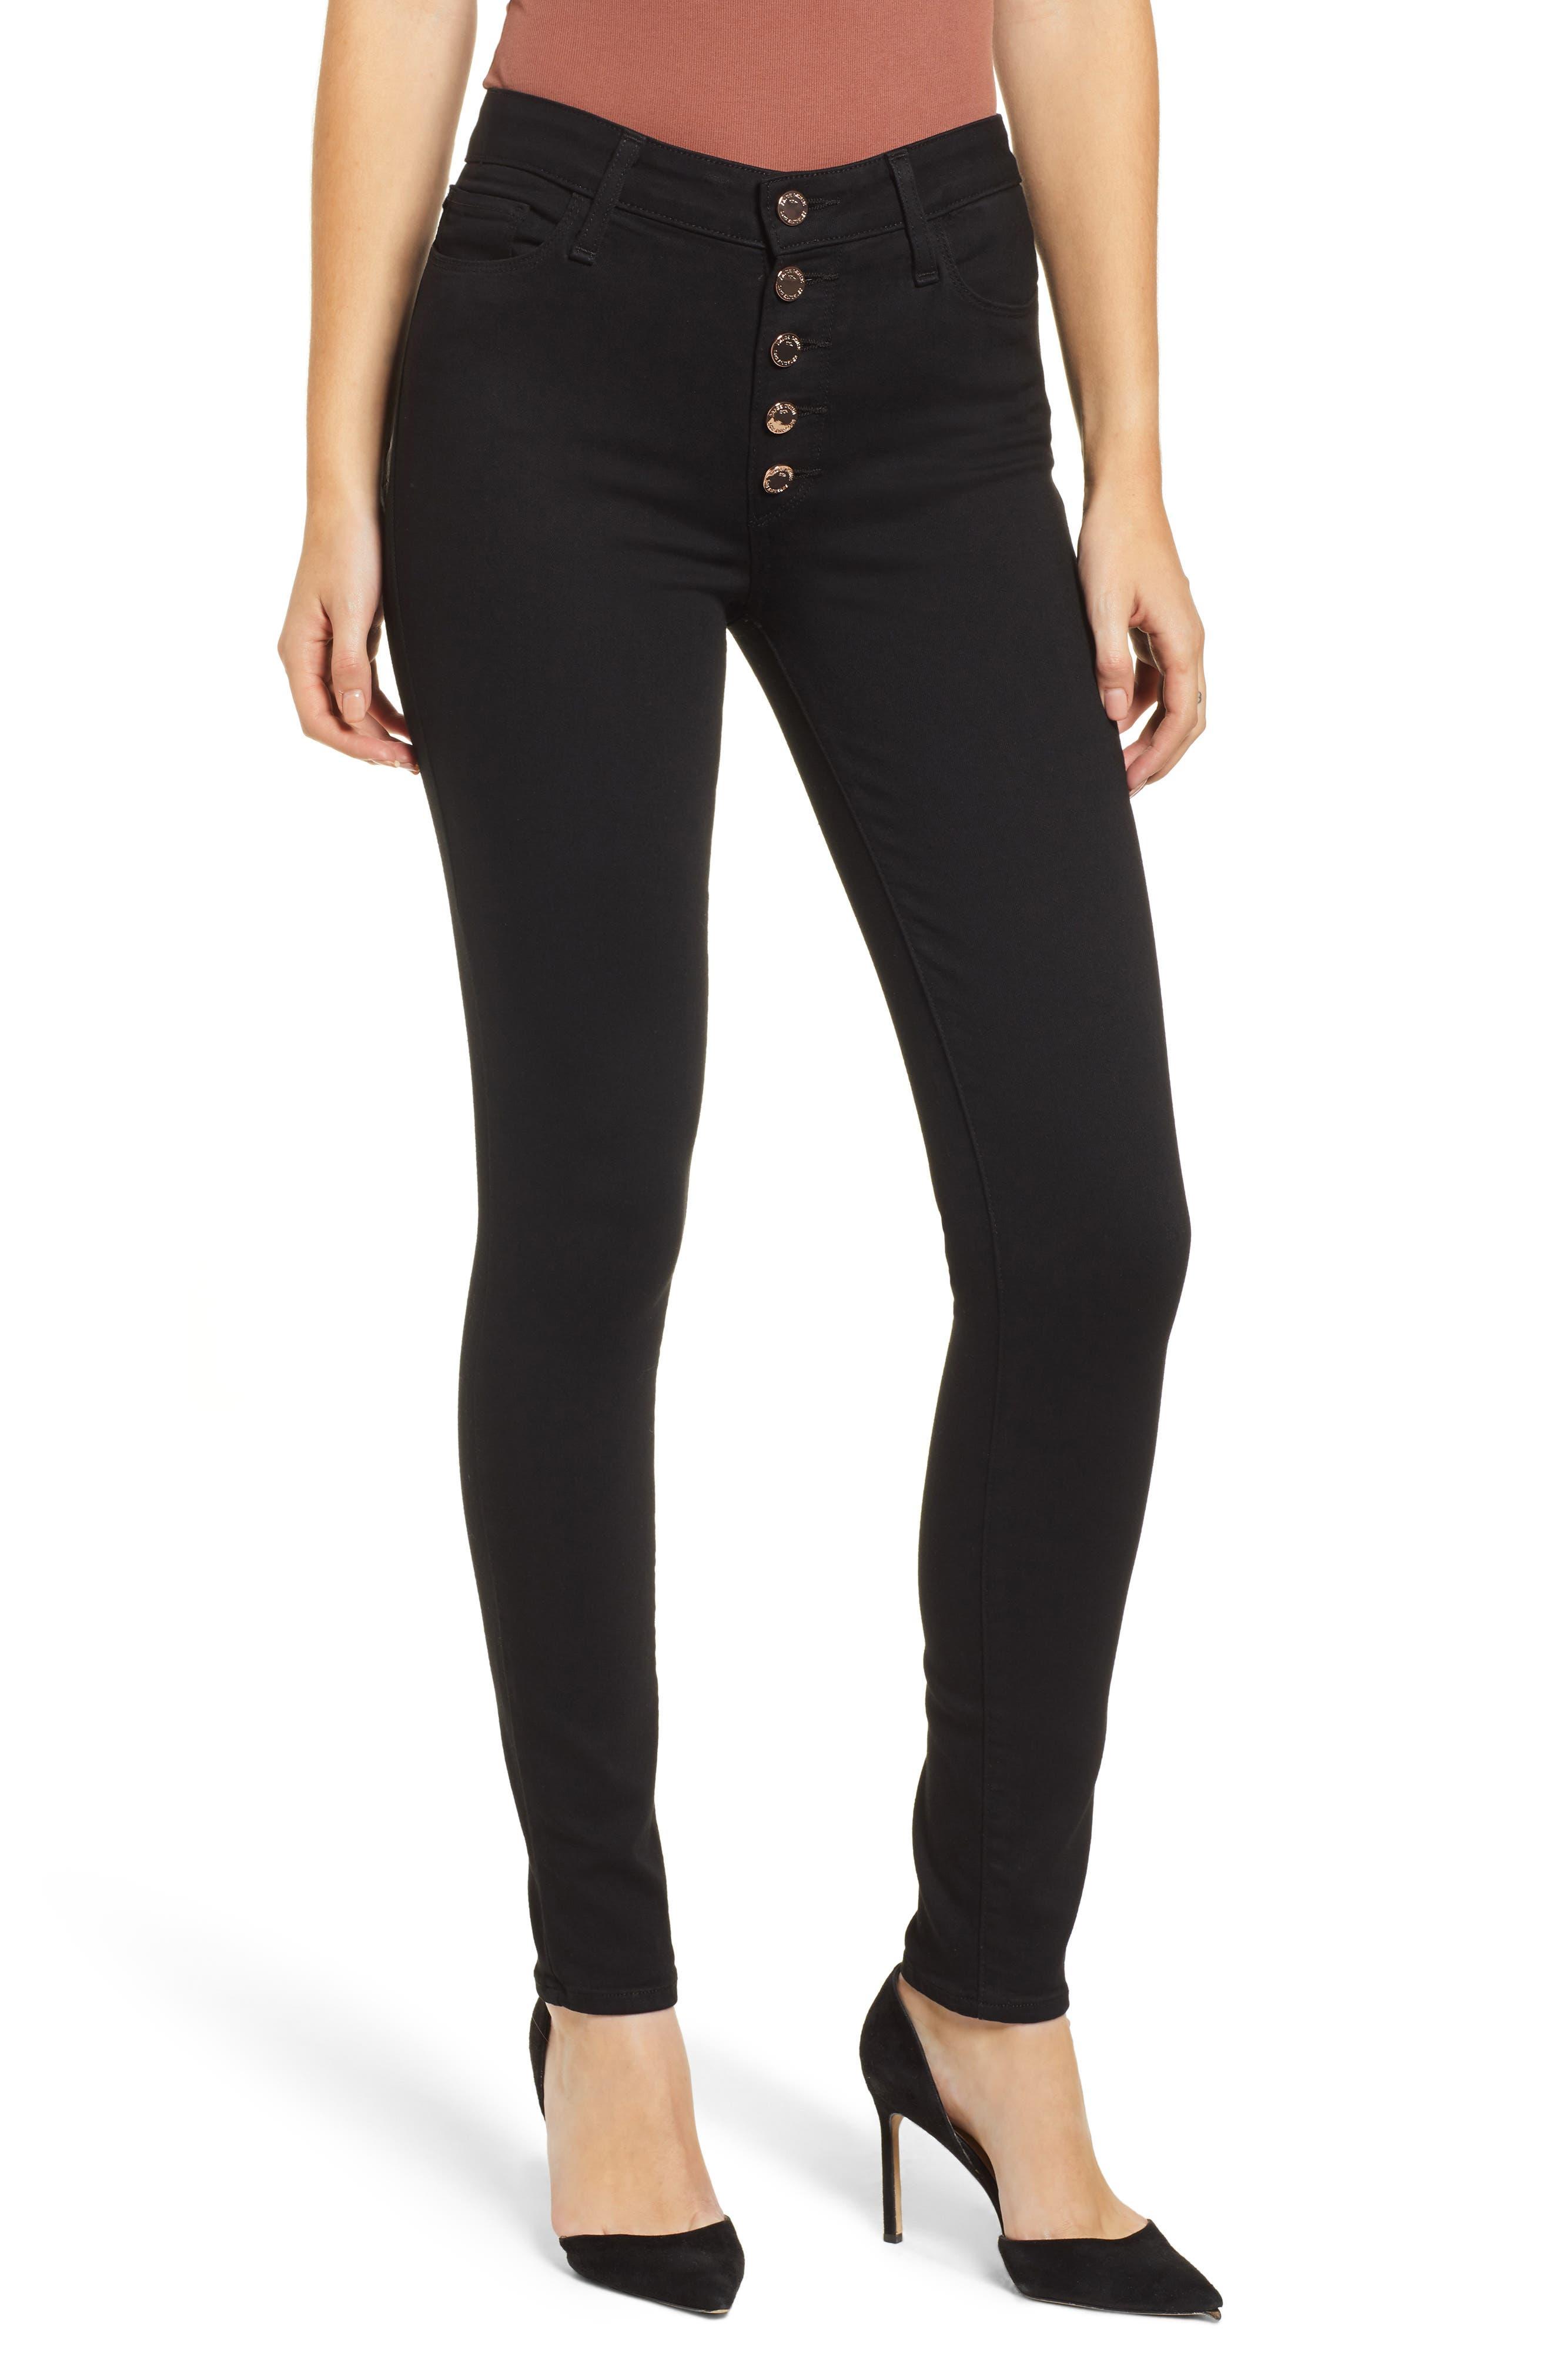 PAIGE Transcend Hoxton High Waist Ultra Skinny Jeans